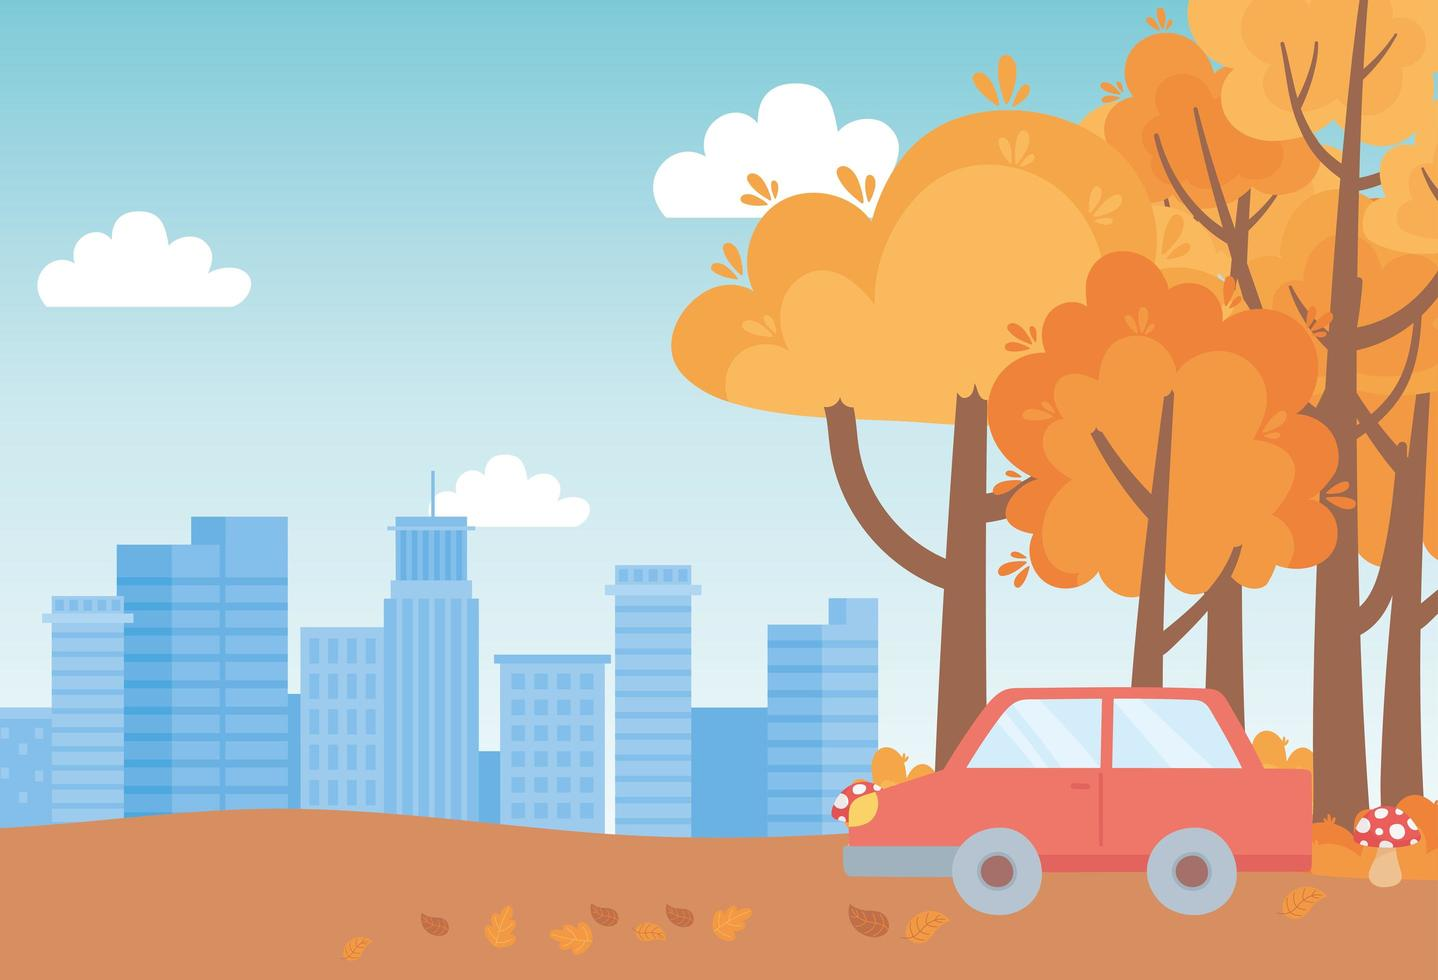 Landschaft im Herbst. Auto, Pilze, Bäume und Stadtbild vektor